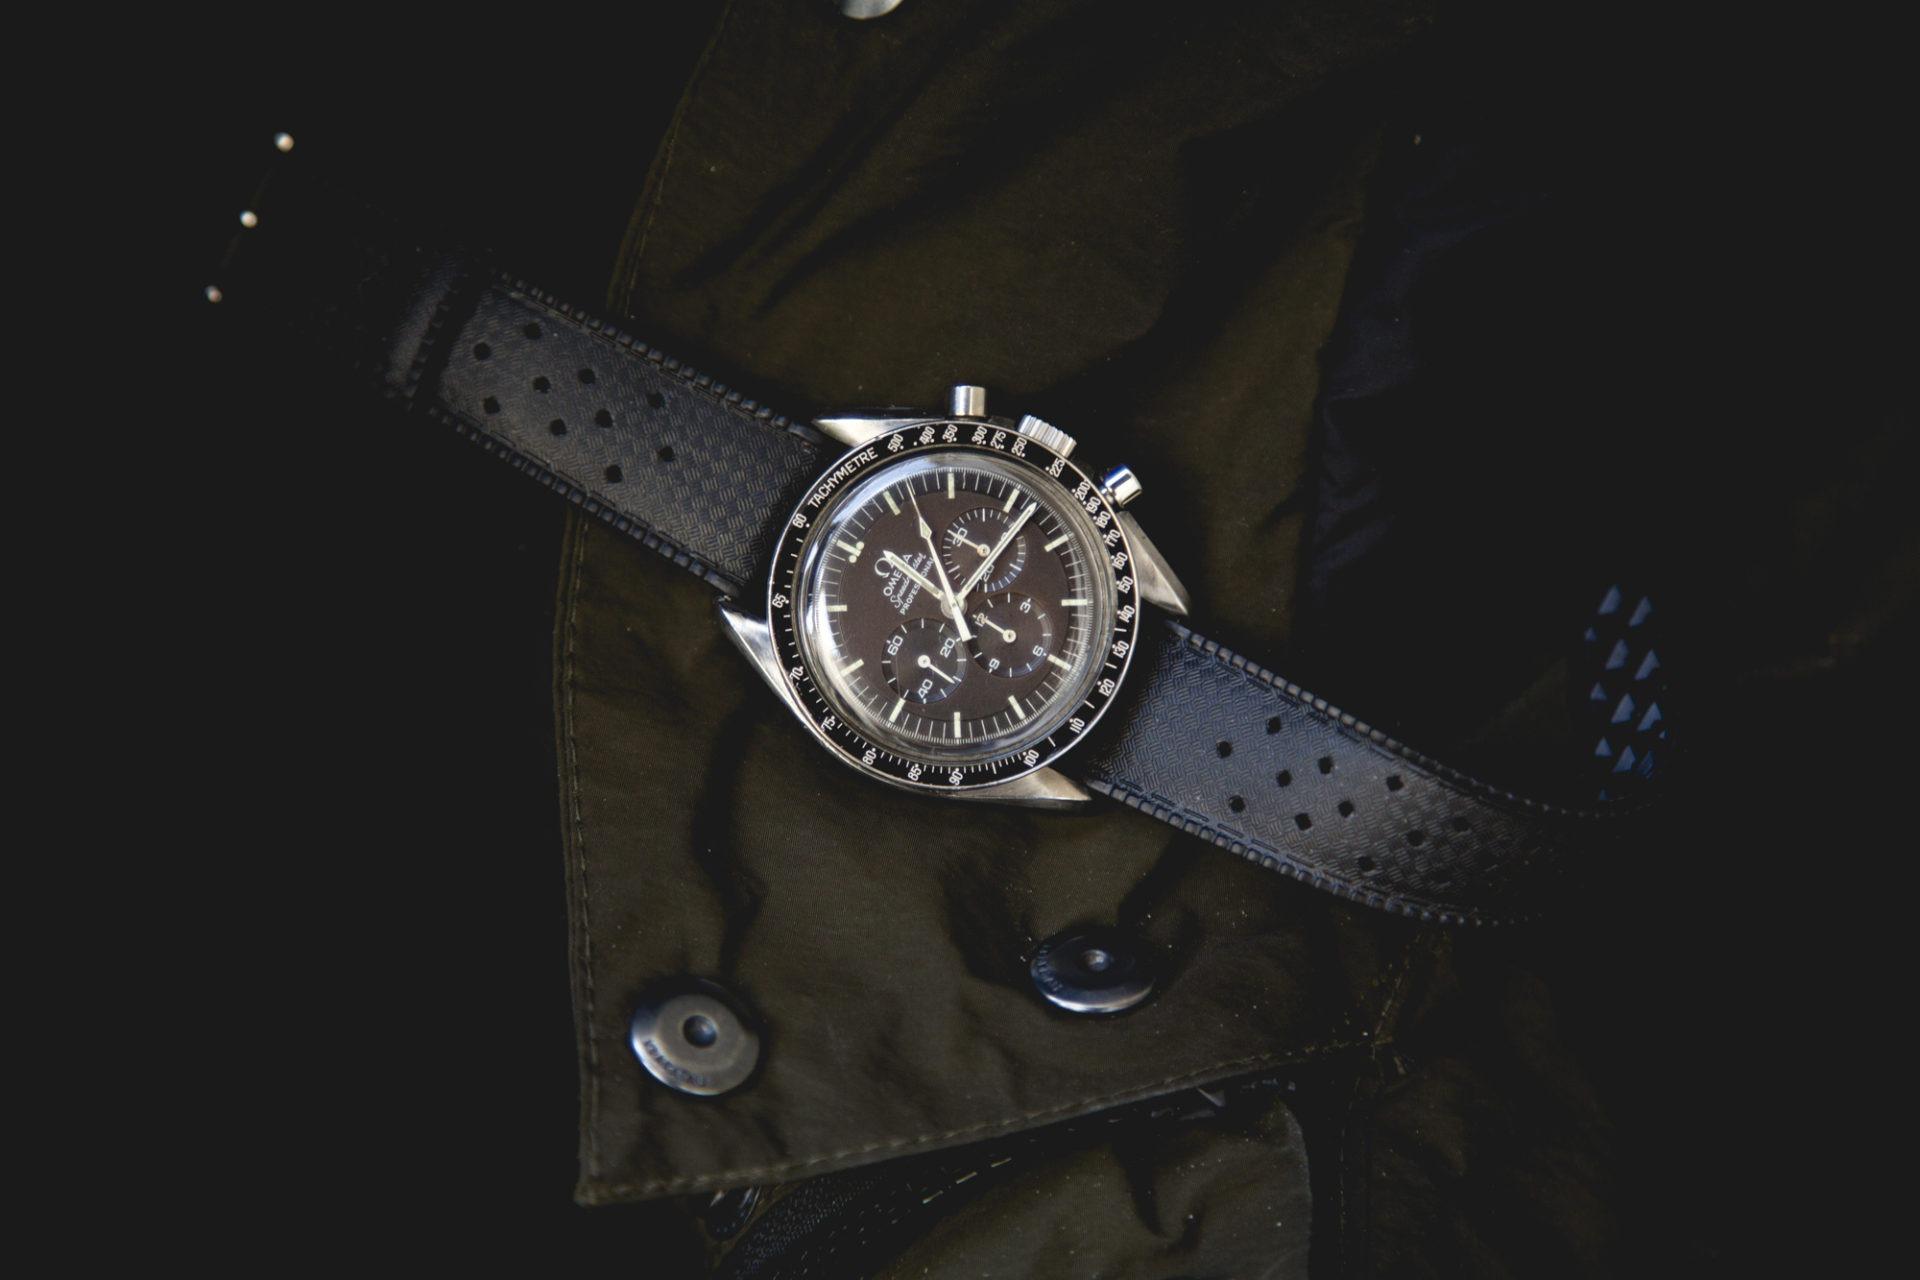 Bracelet Tropic Joseph Bonnie - Omega Speedmaster 145.022-69